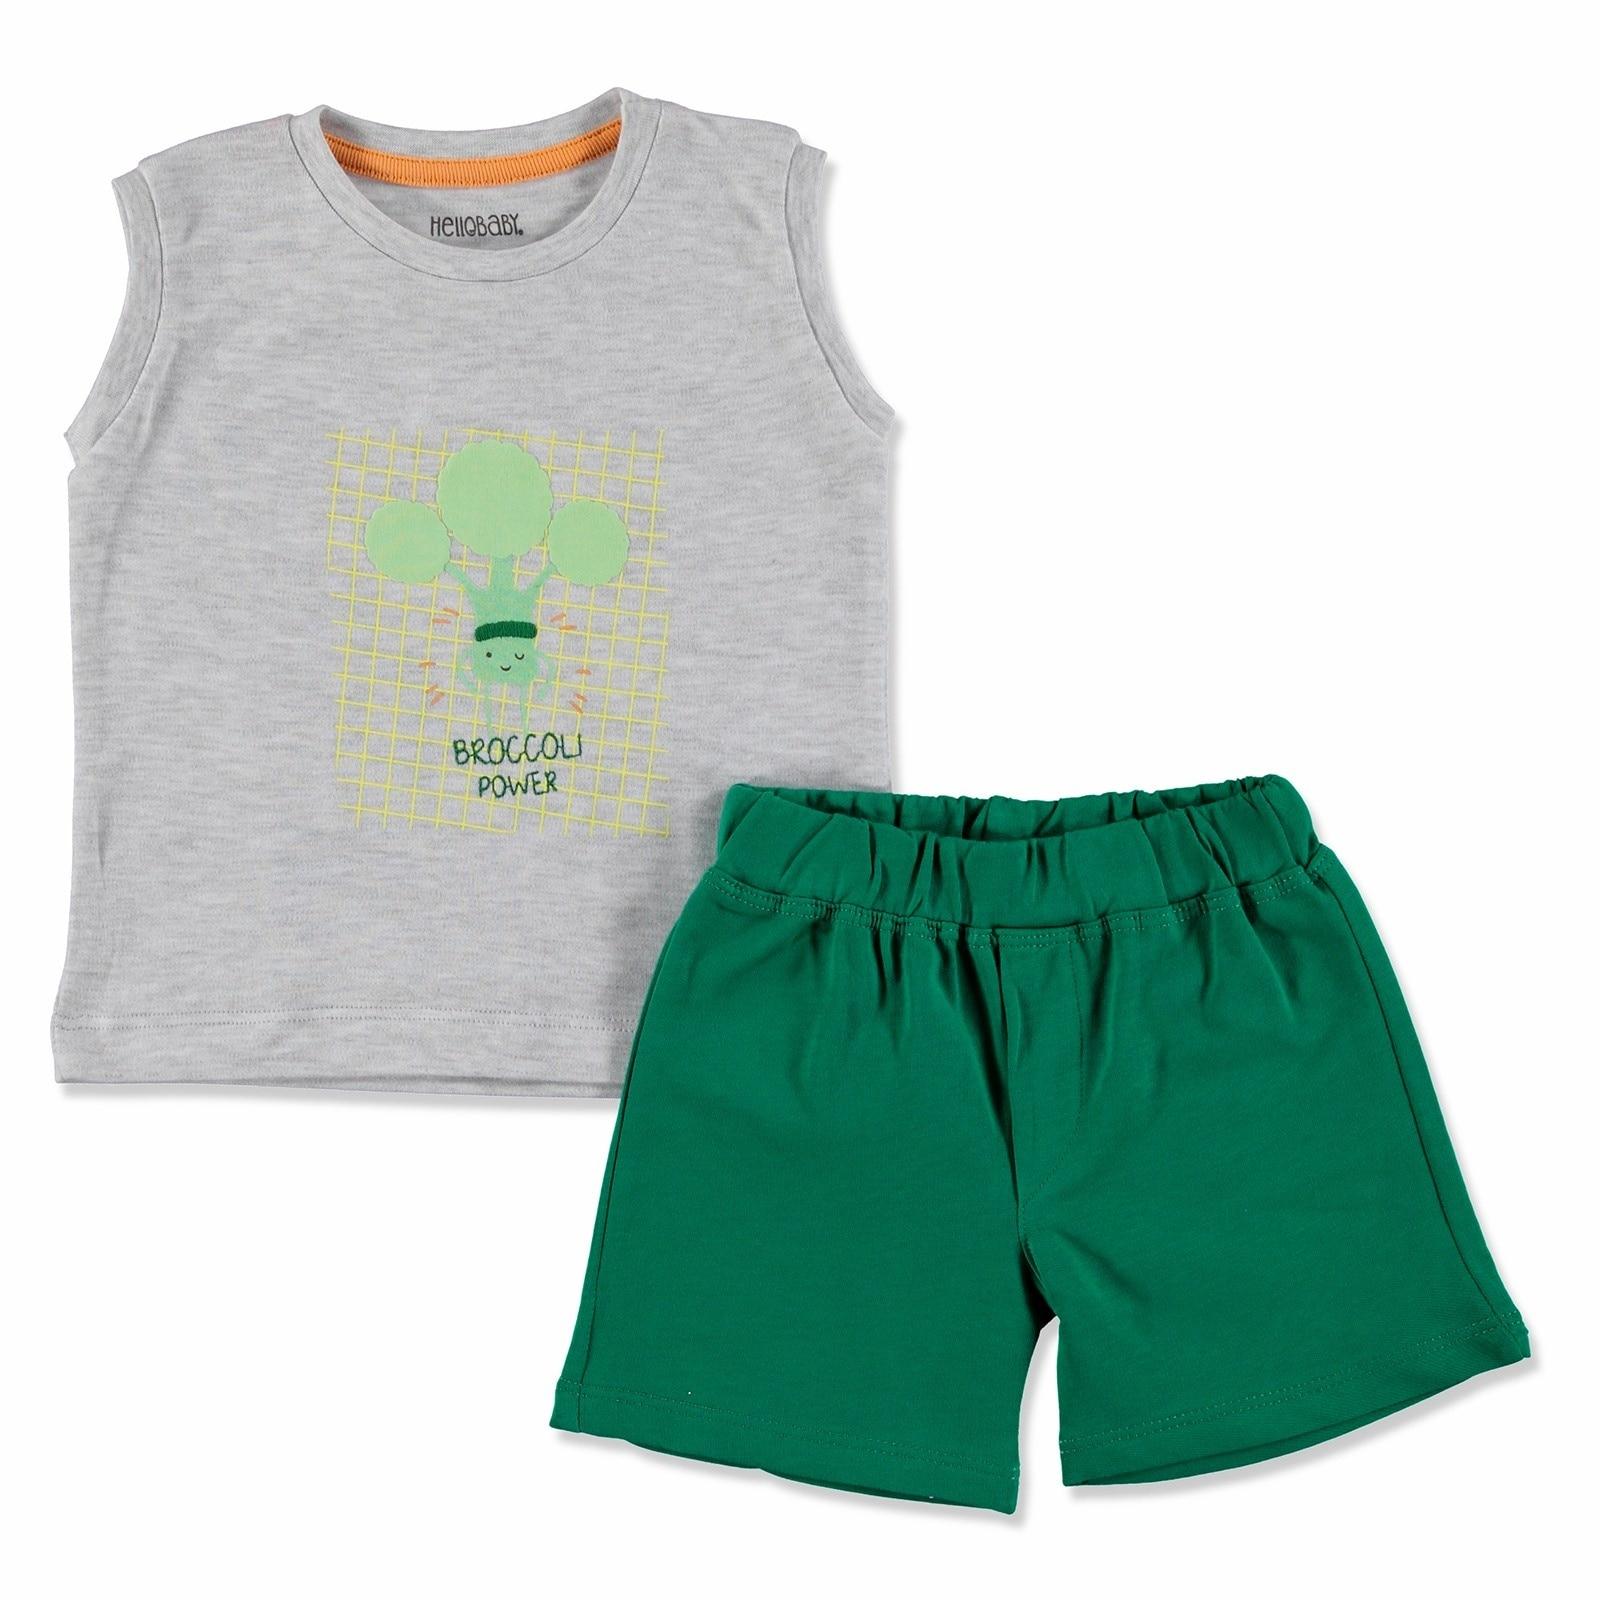 Ebebek HelloBaby Summer Baby Sweet Vegetables Sleeveless Athlete Top Short Set